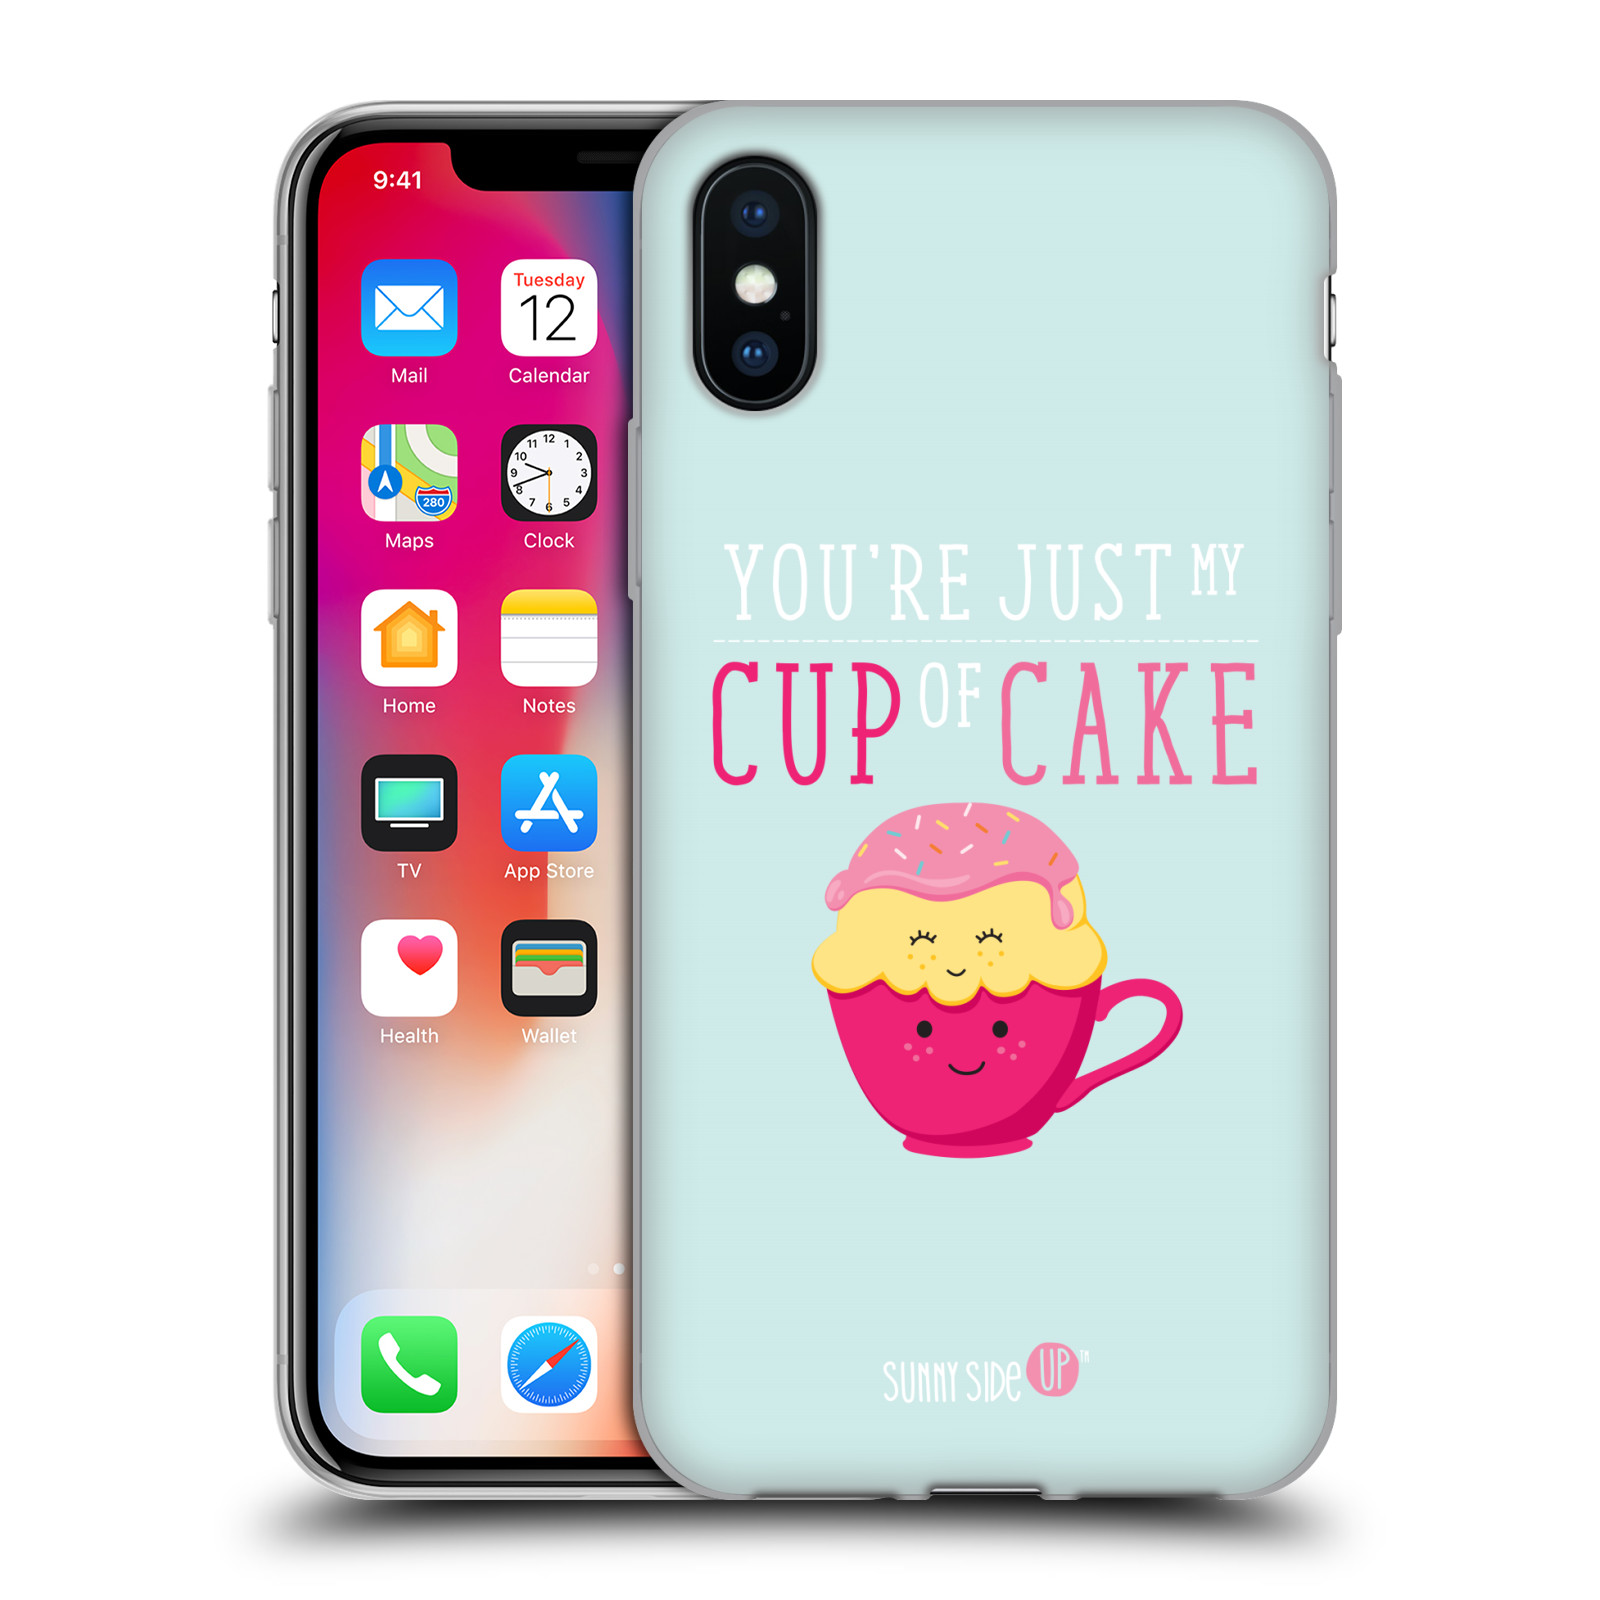 MUY-POP-PARTE-SOLARE-IN-SU-DOLCIUMI-CASE-IN-GEL-PER-APPLE-iPHONE-TELEFONI